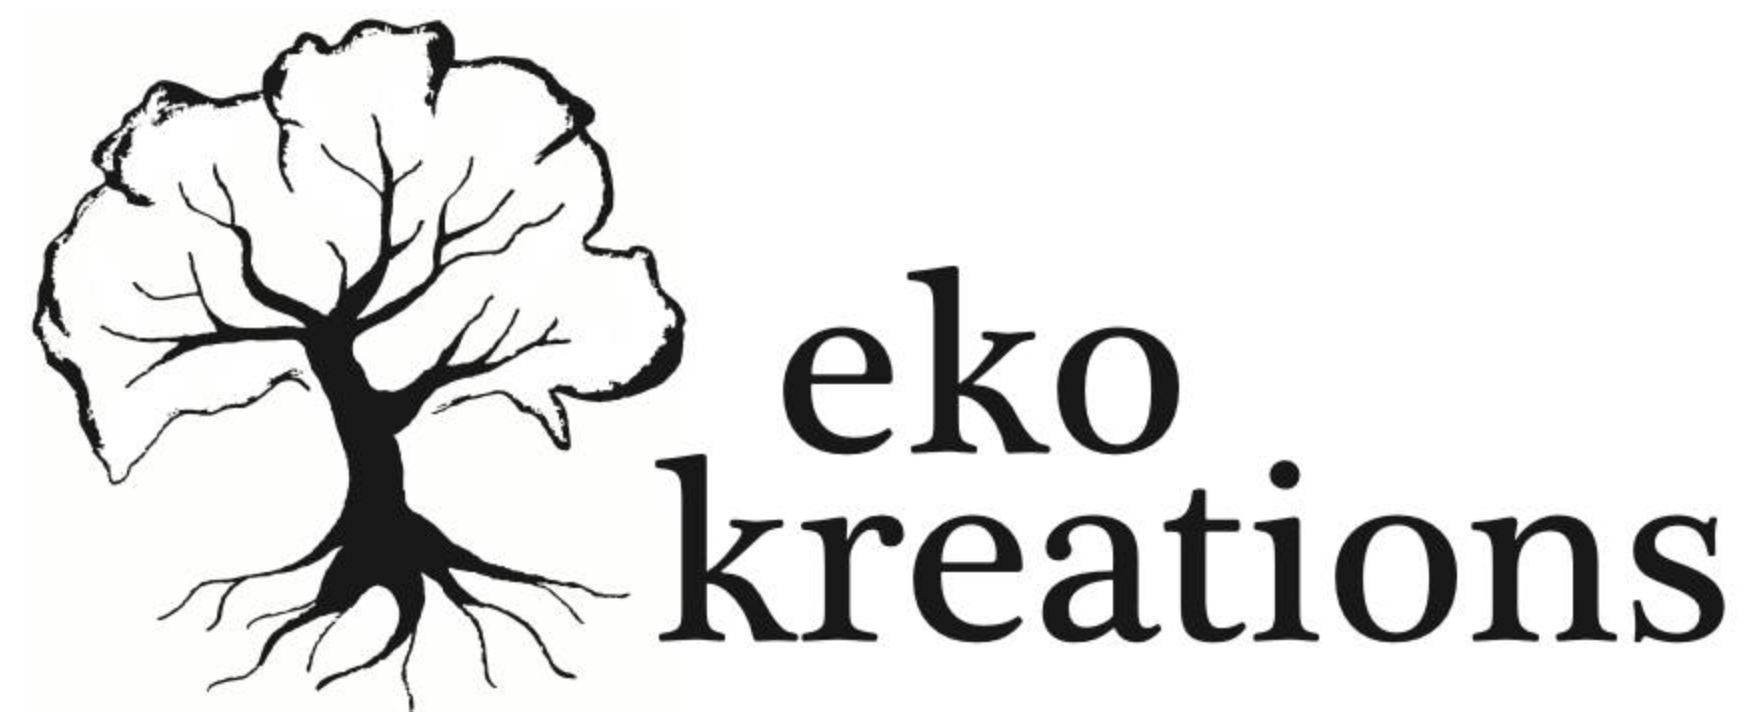 Eko Kreations logo.jpg